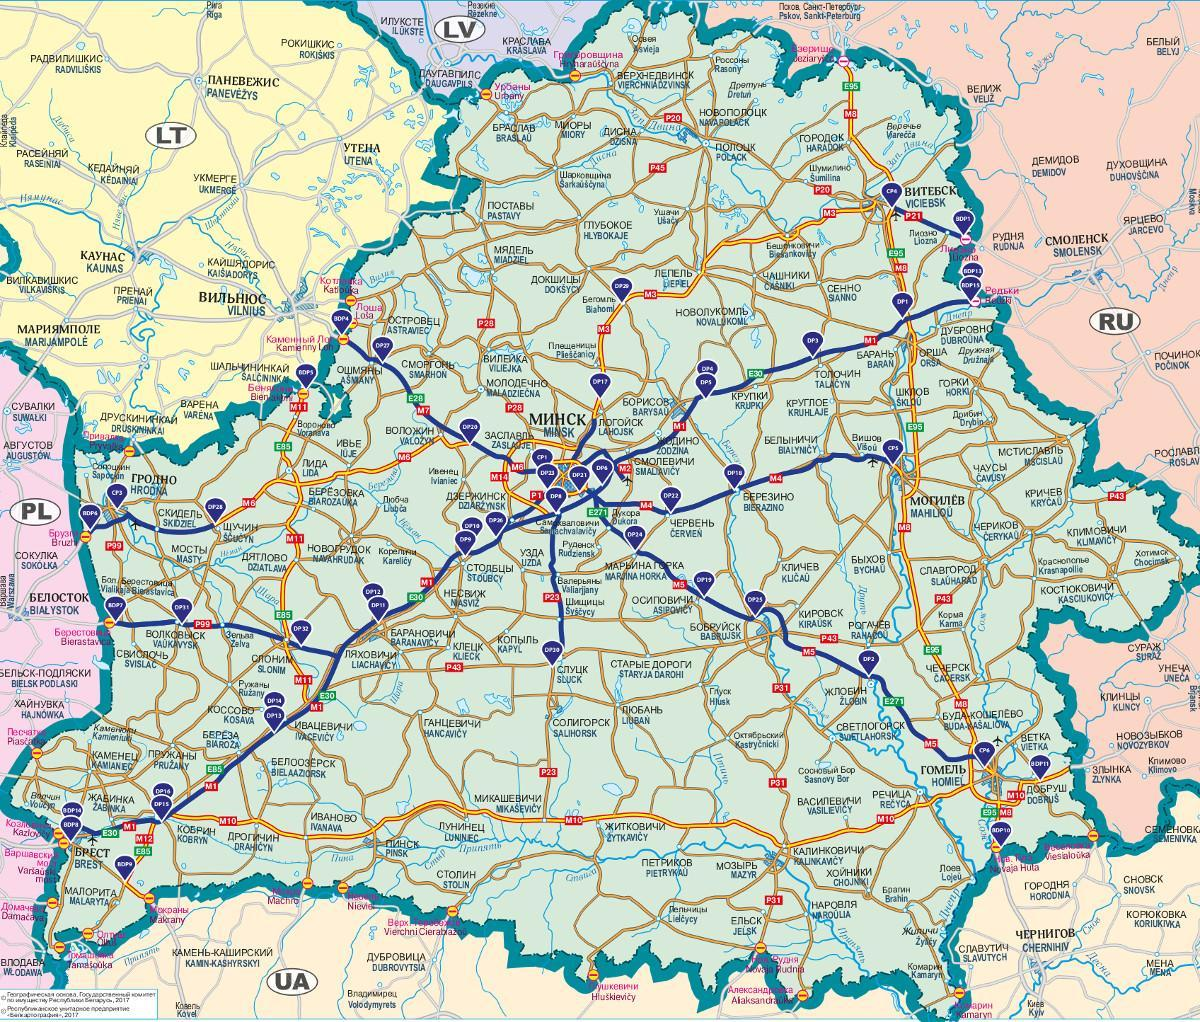 Opłaty za drogi na Białorusi - system Beltoll